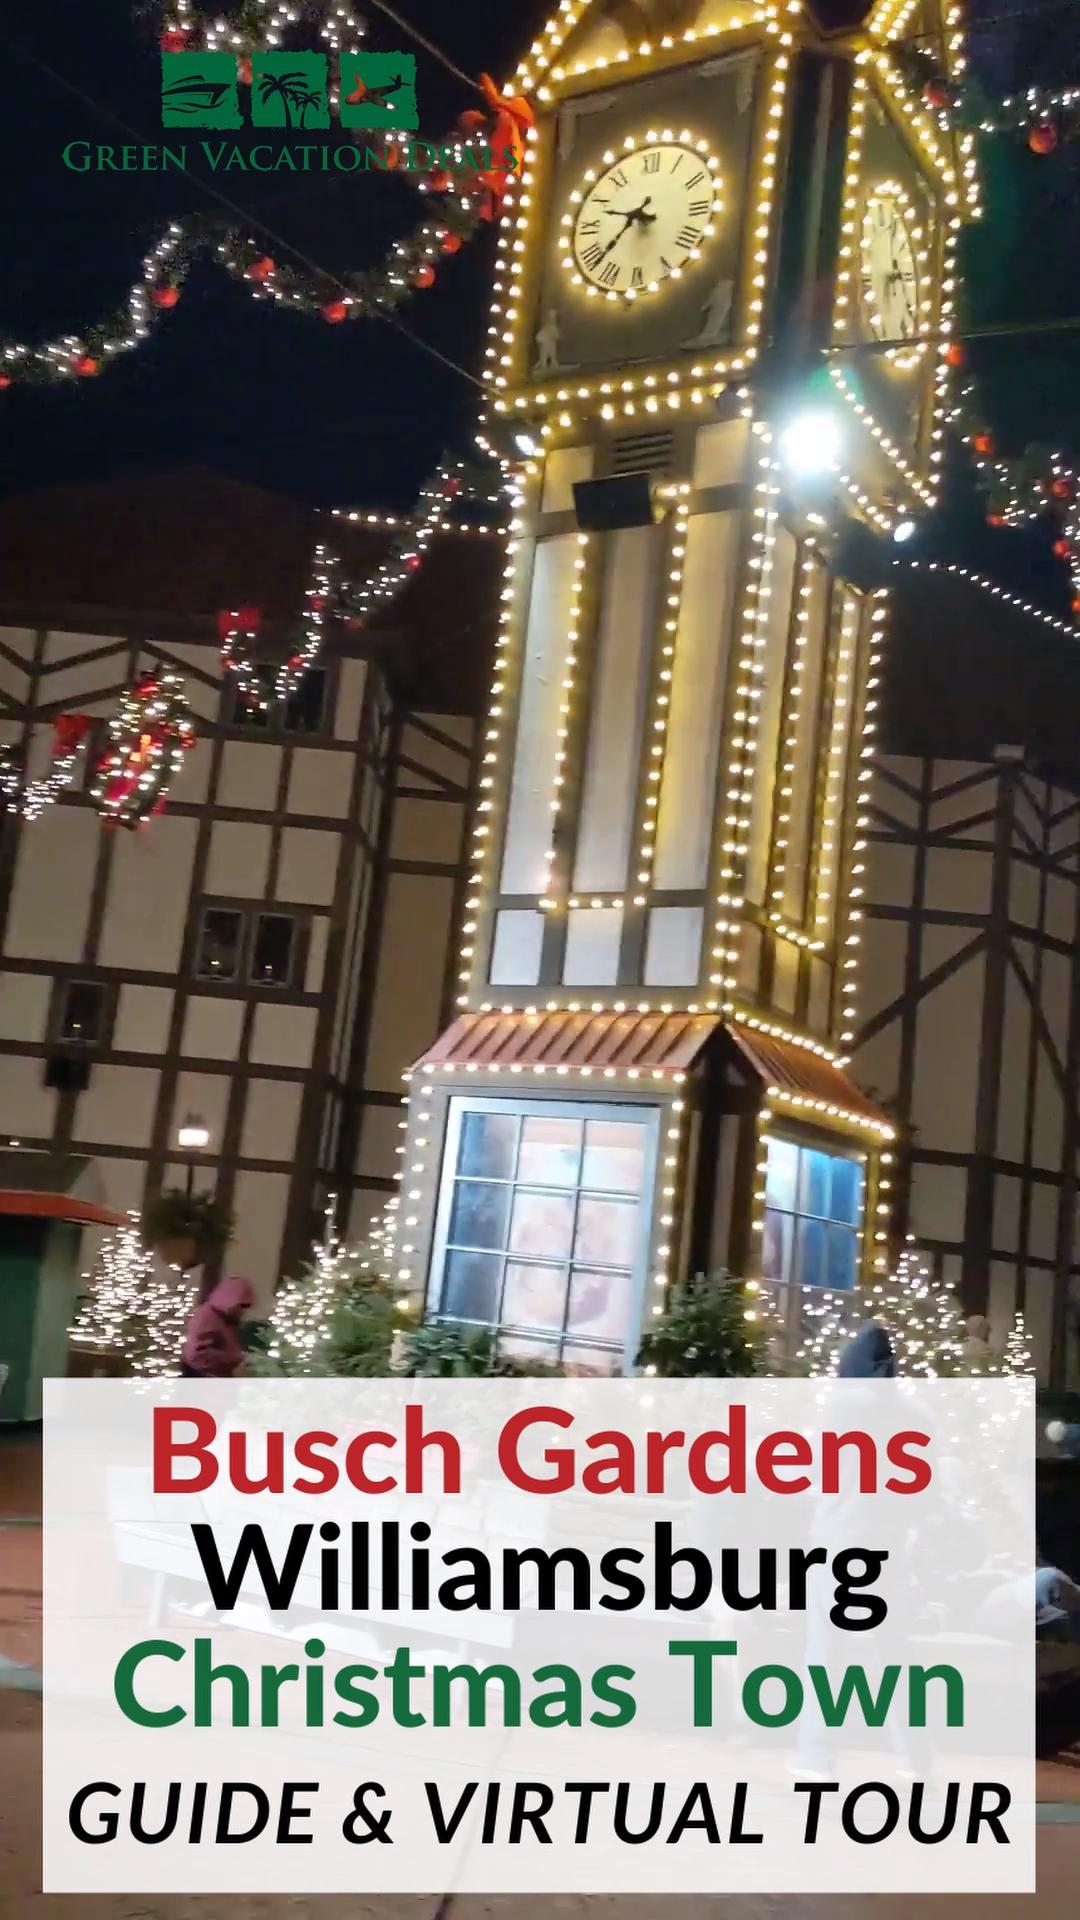 3167d64d307e8d0d08a067e8db46c6bb - Busch Gardens Discount Christmas Town Tickets